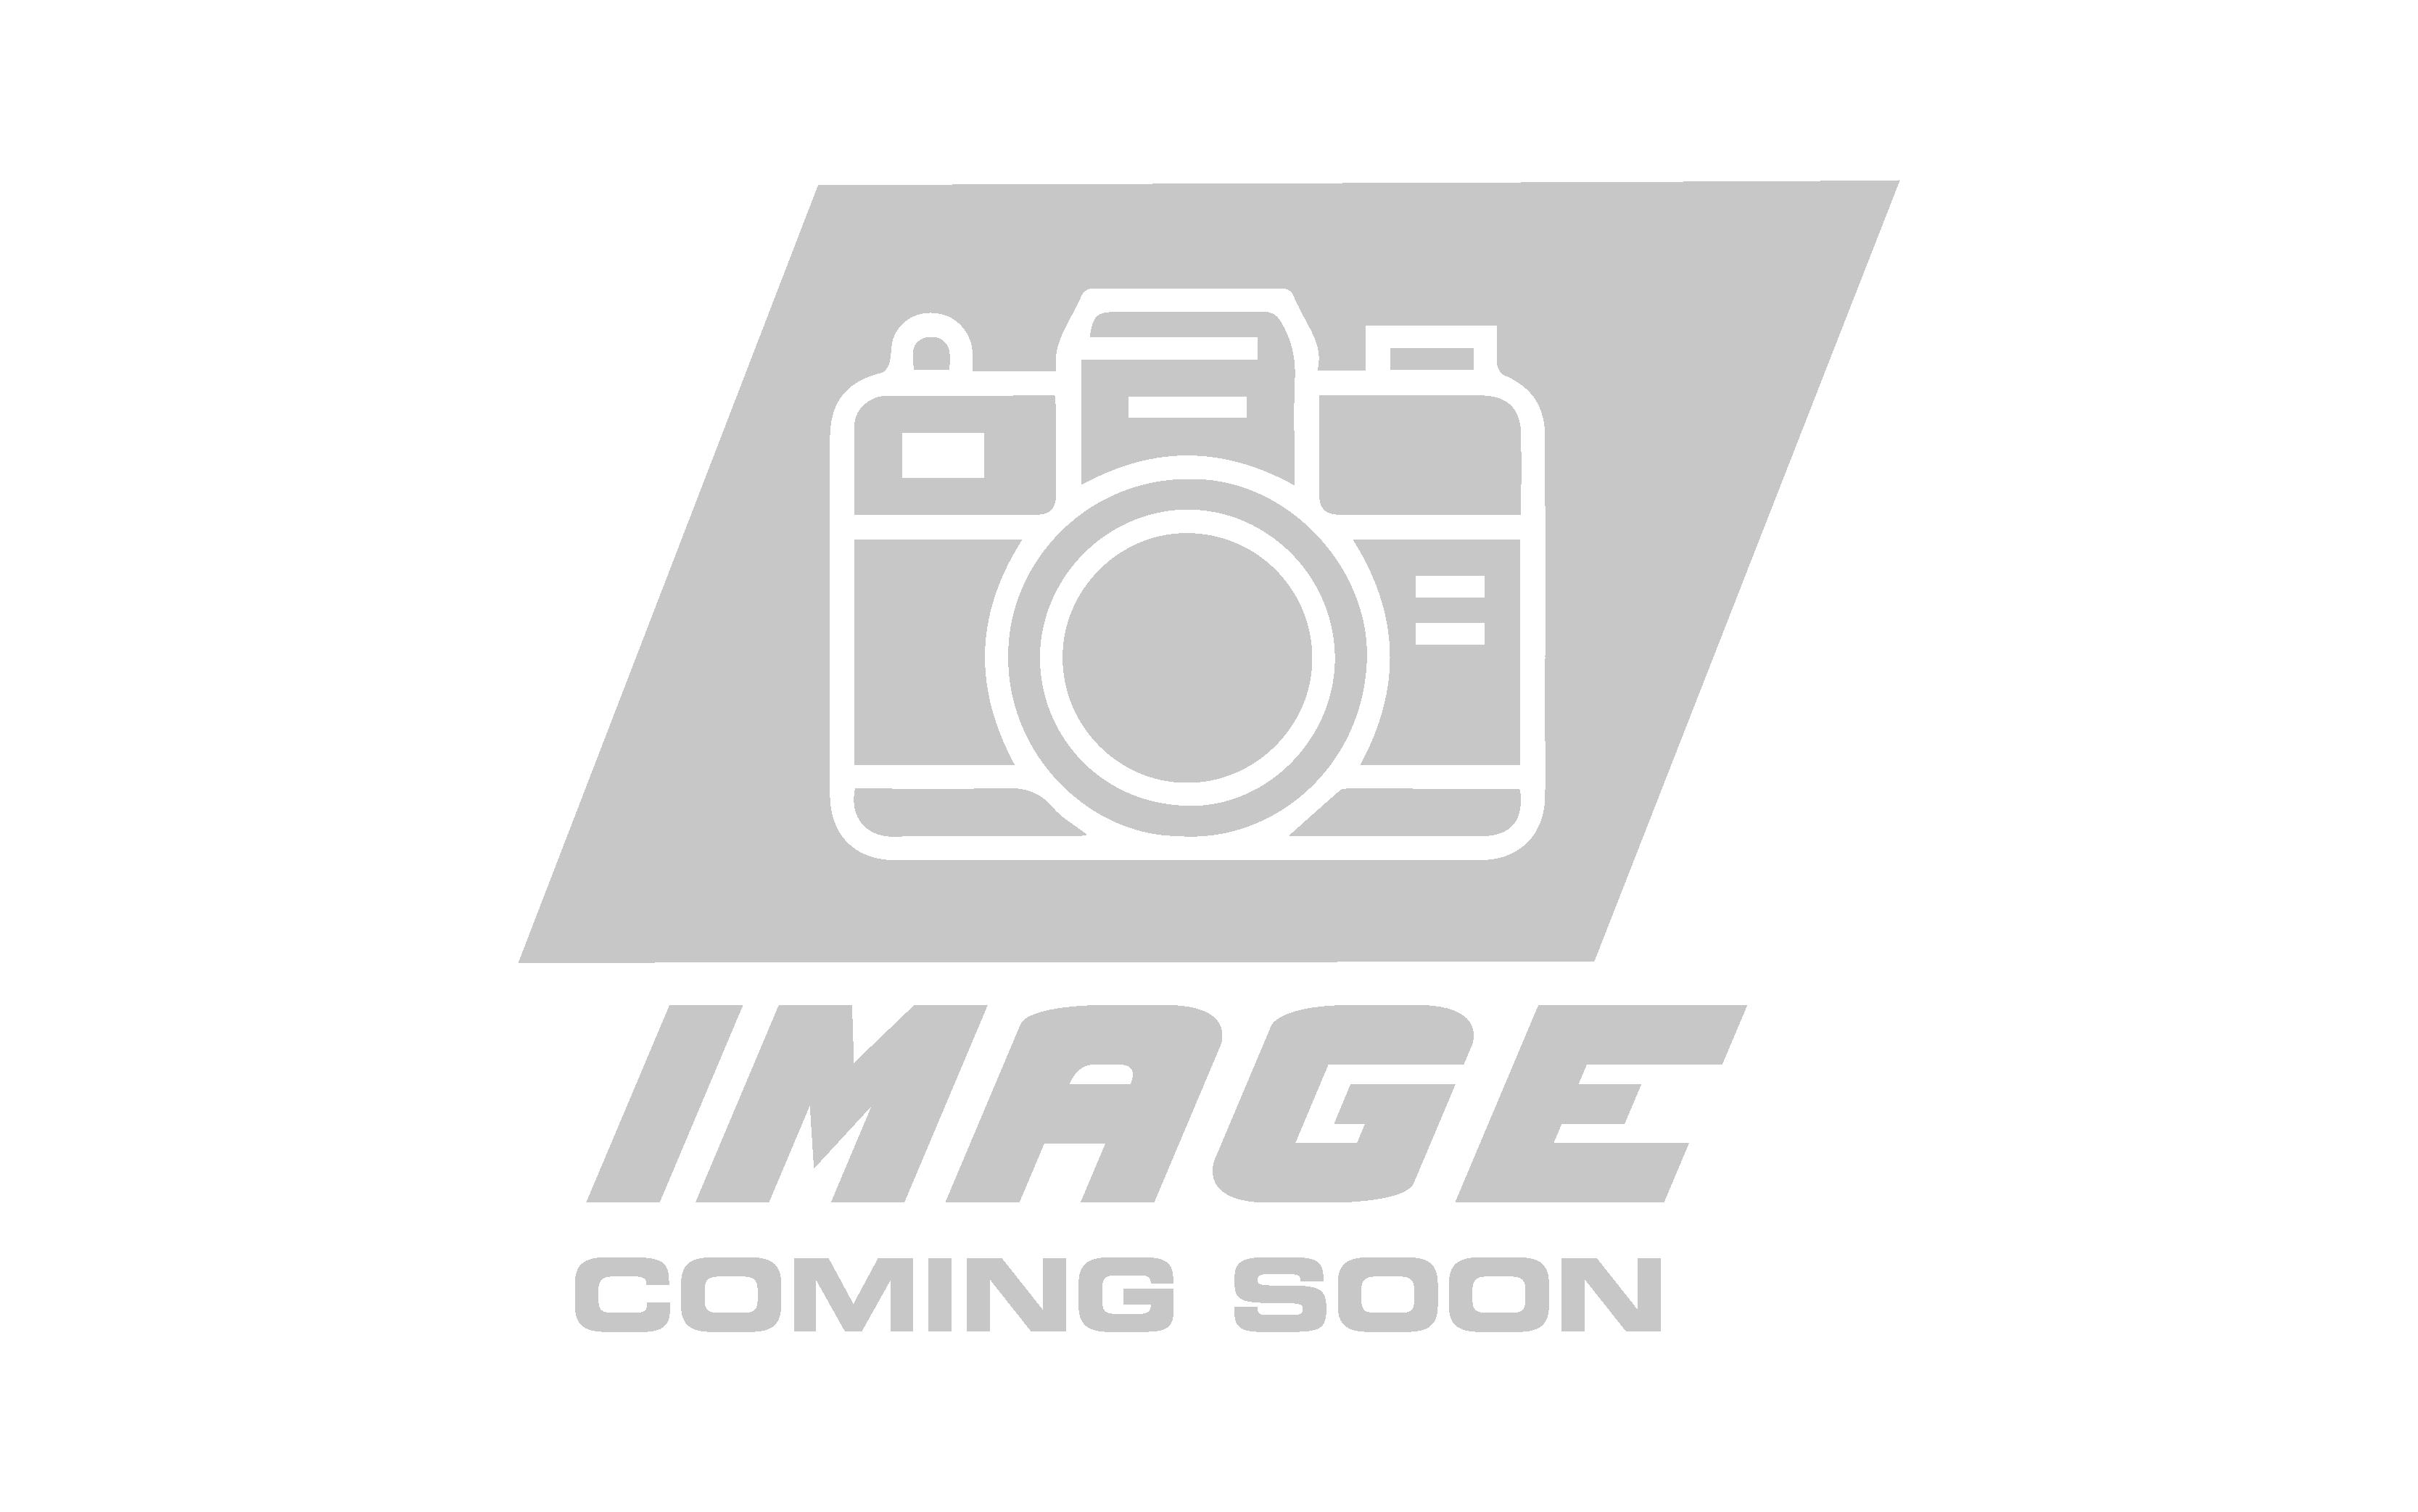 Bmw E30 E36 Compact Koni Sport Rear Shocks Bag Riders